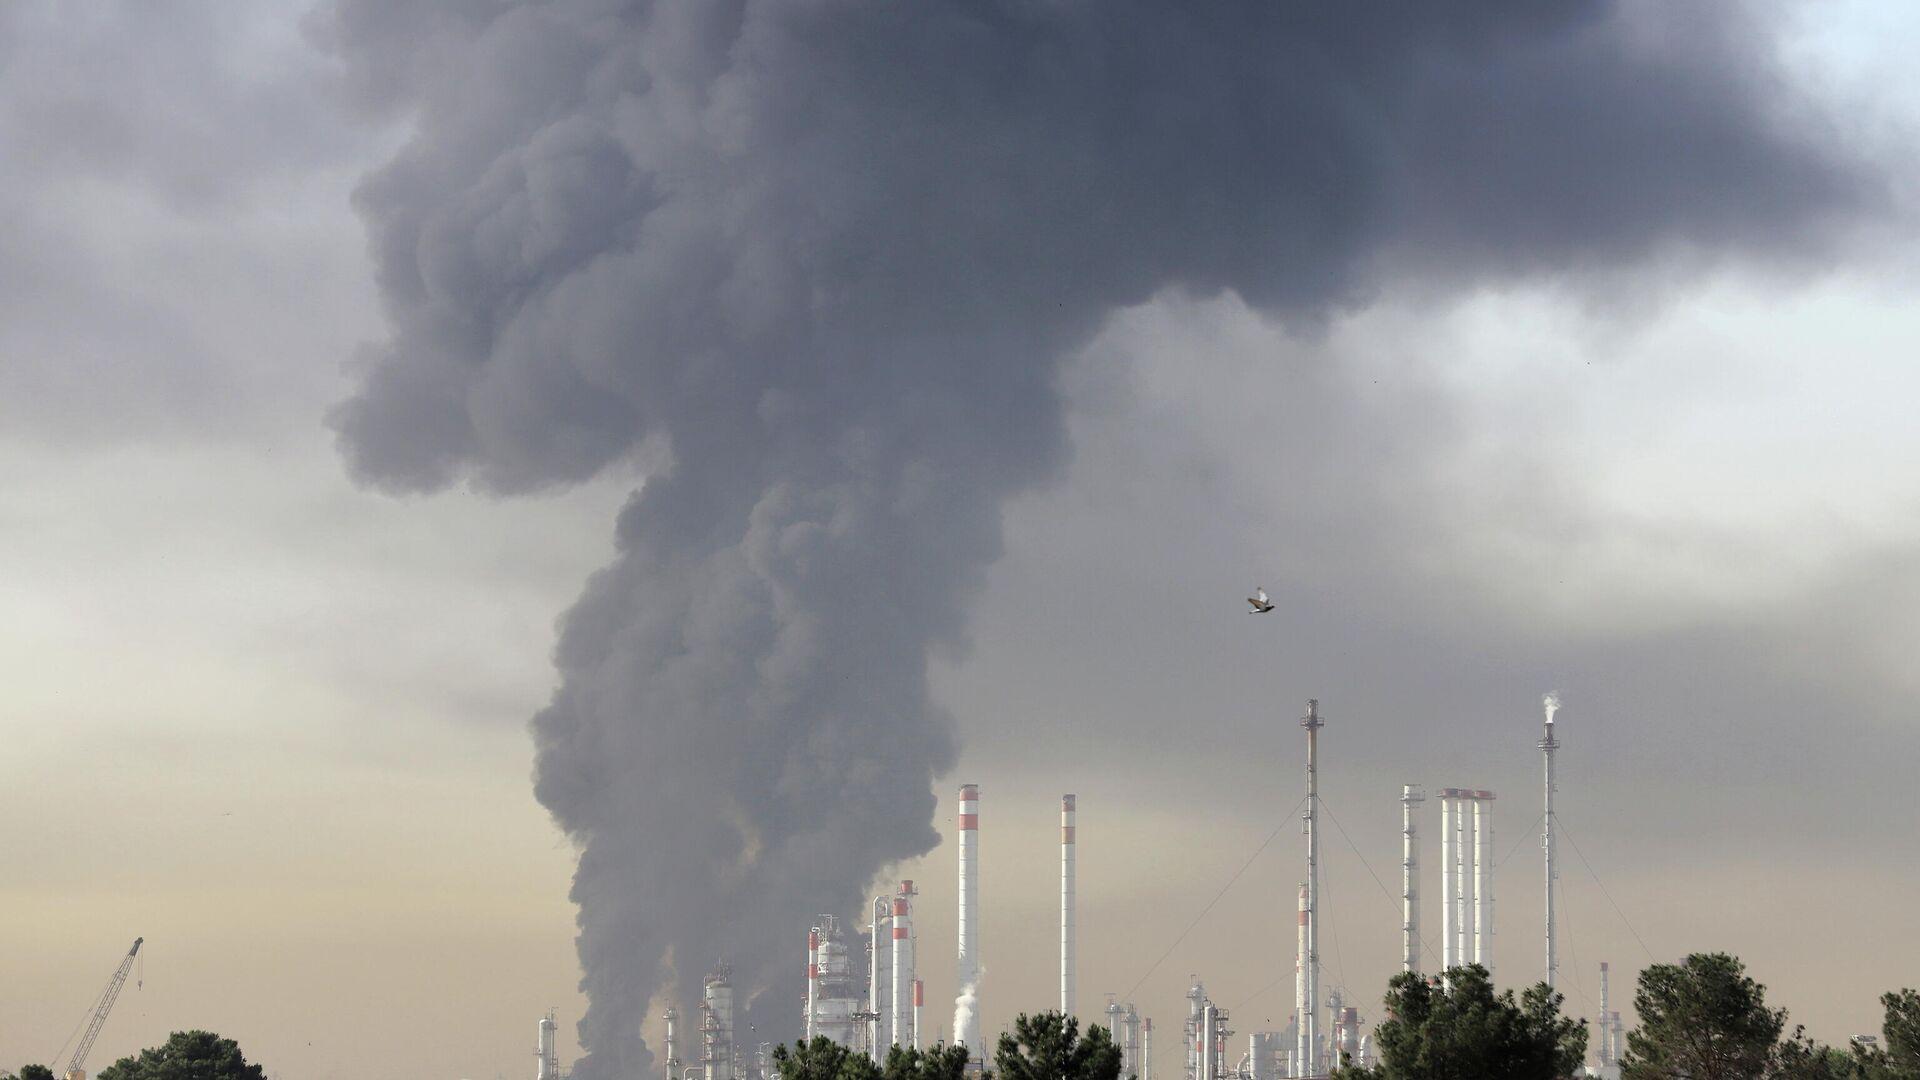 Esplosione in un fabbrica in Iran - Sputnik Italia, 1920, 06.06.2021